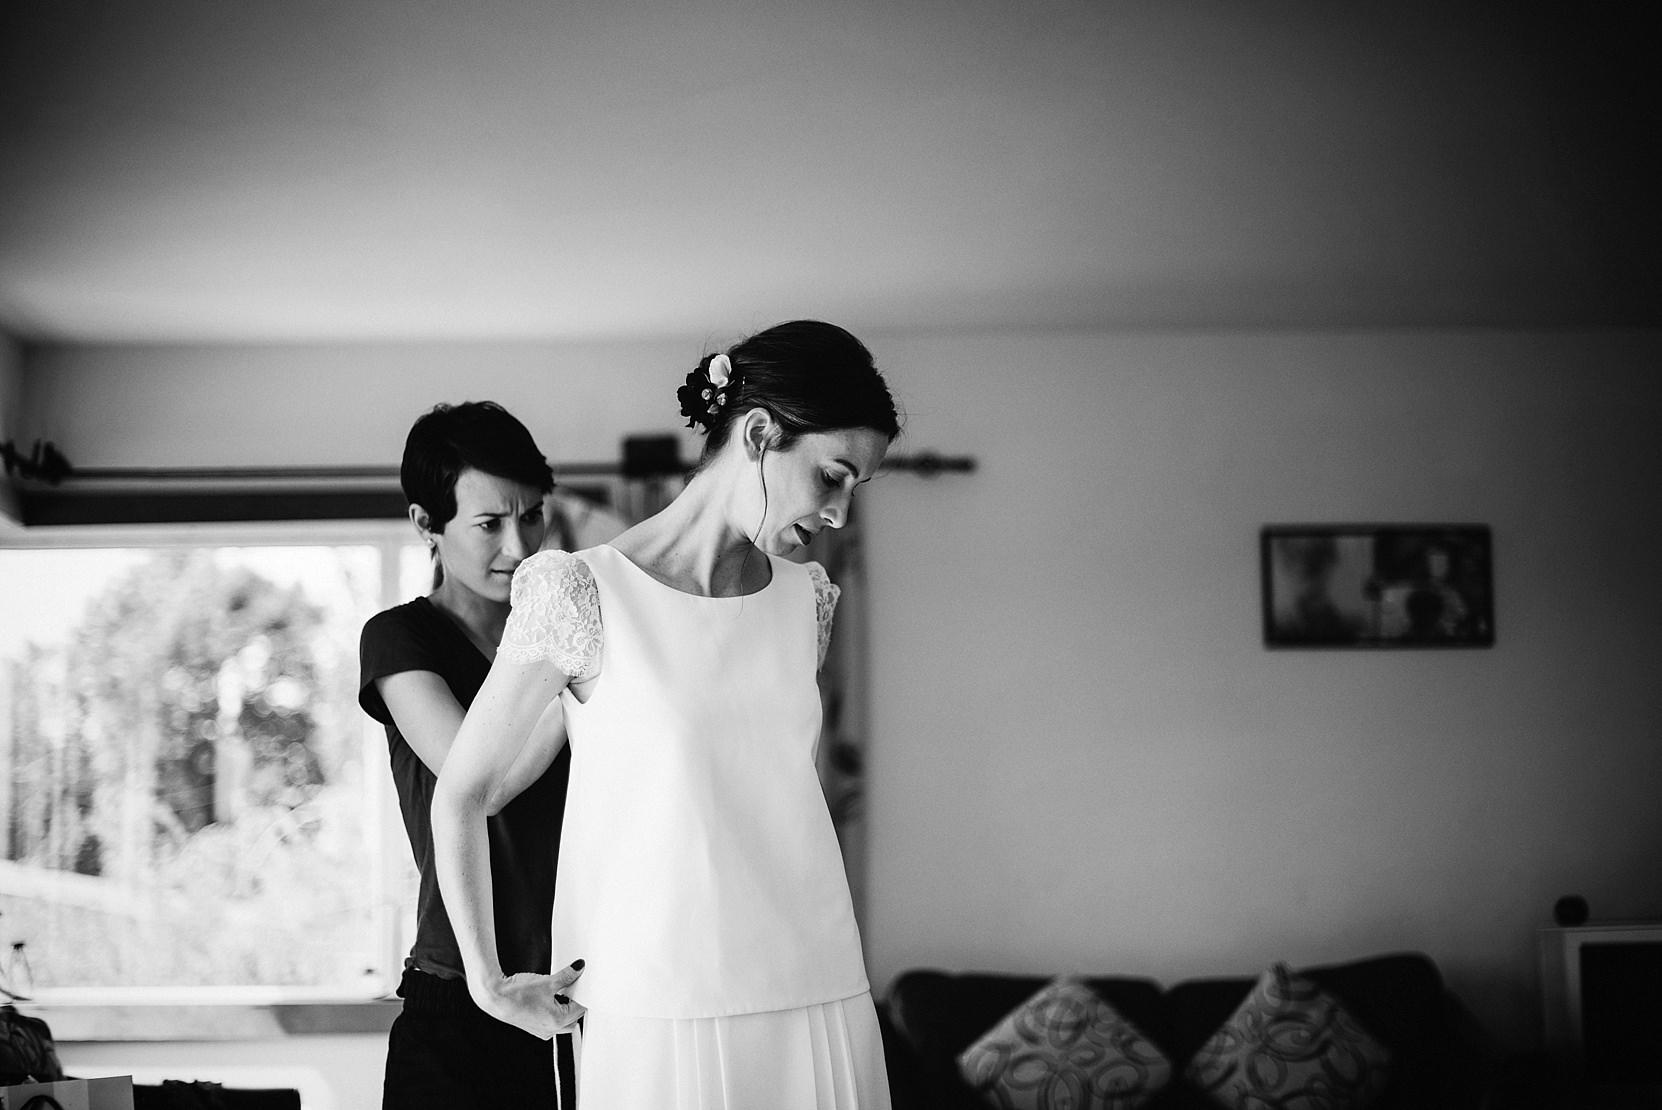 Bridesmaids fixing the brides dress